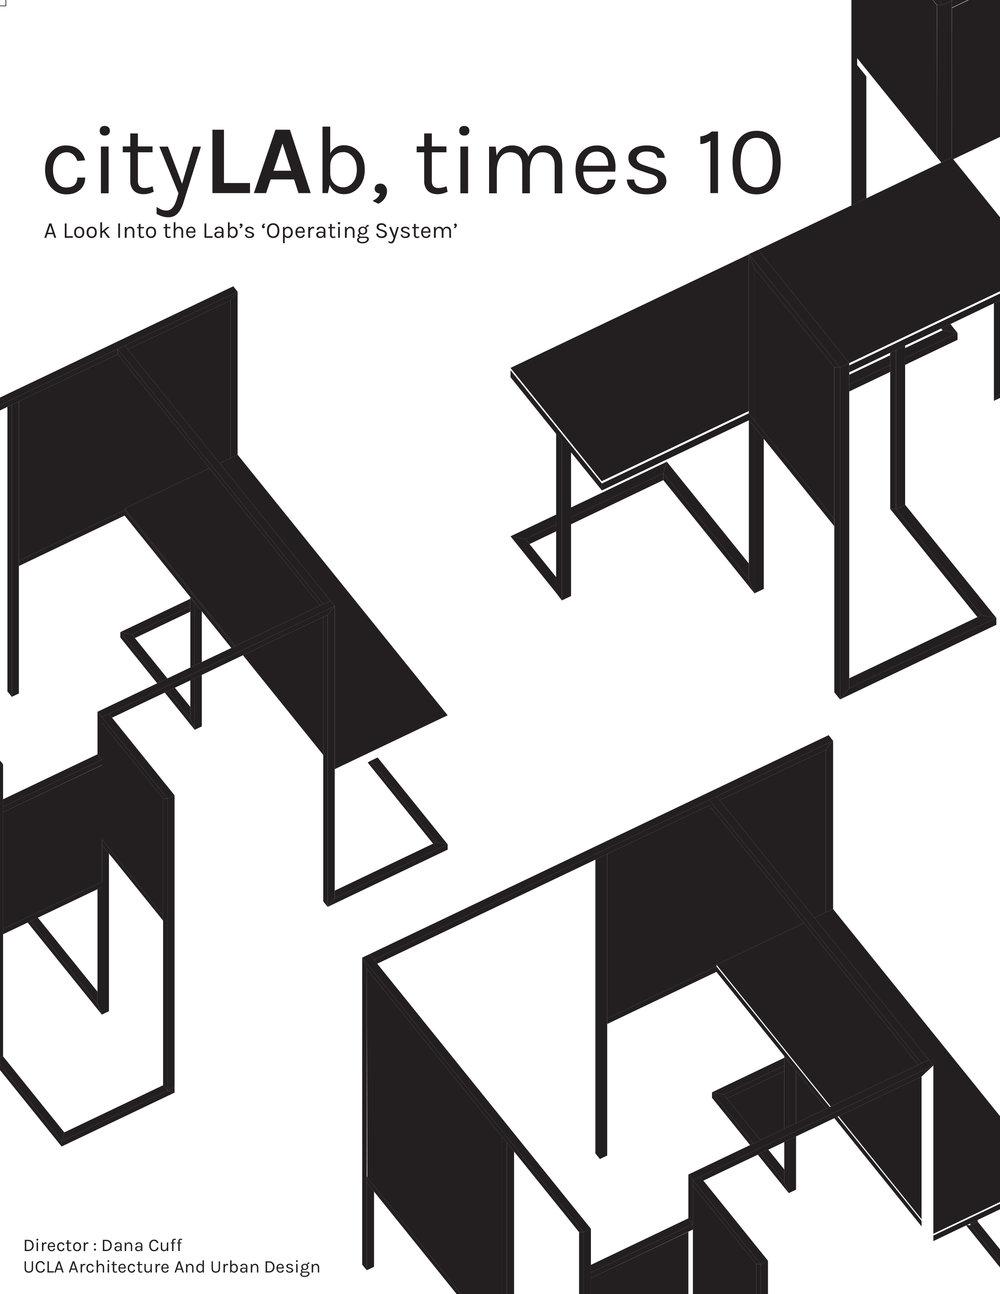 cityLAb, times 10 catalog